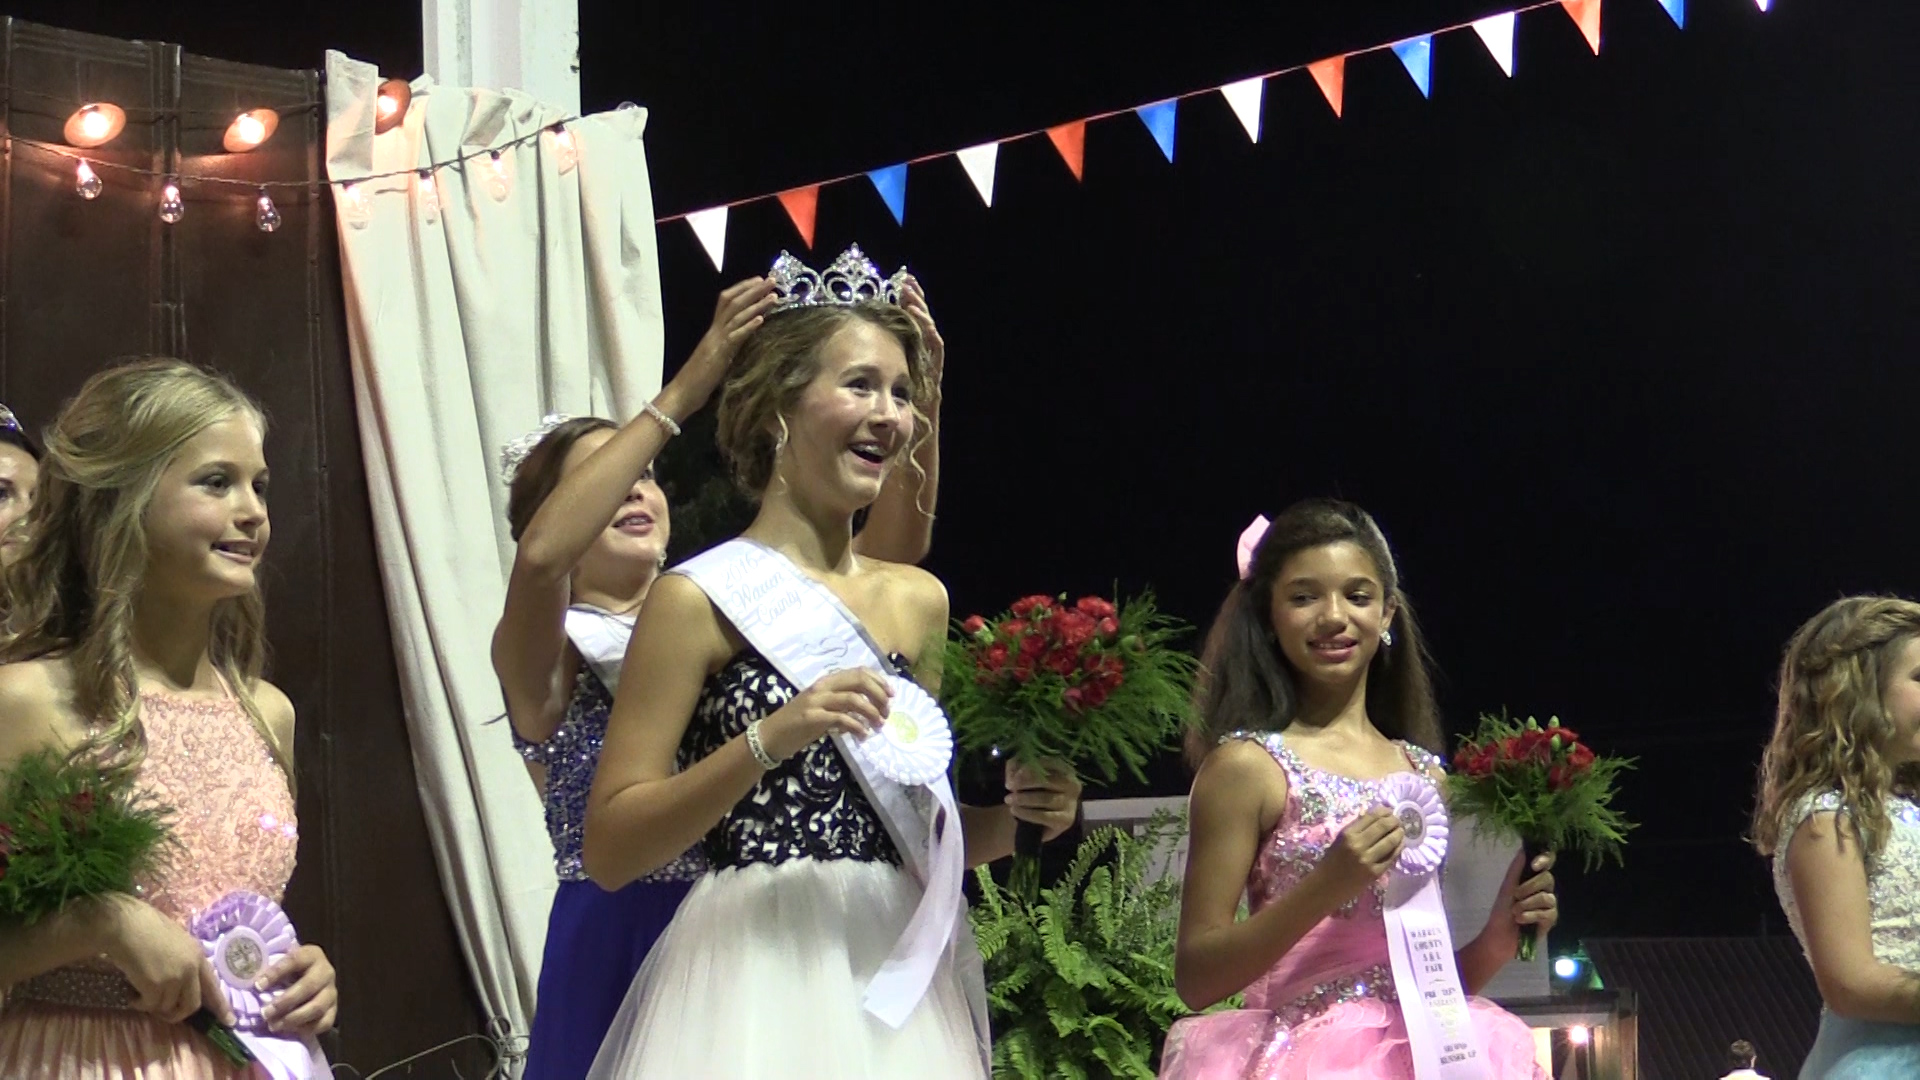 VIDEO: 2016 Preteen Fairest of the Fair Pageant